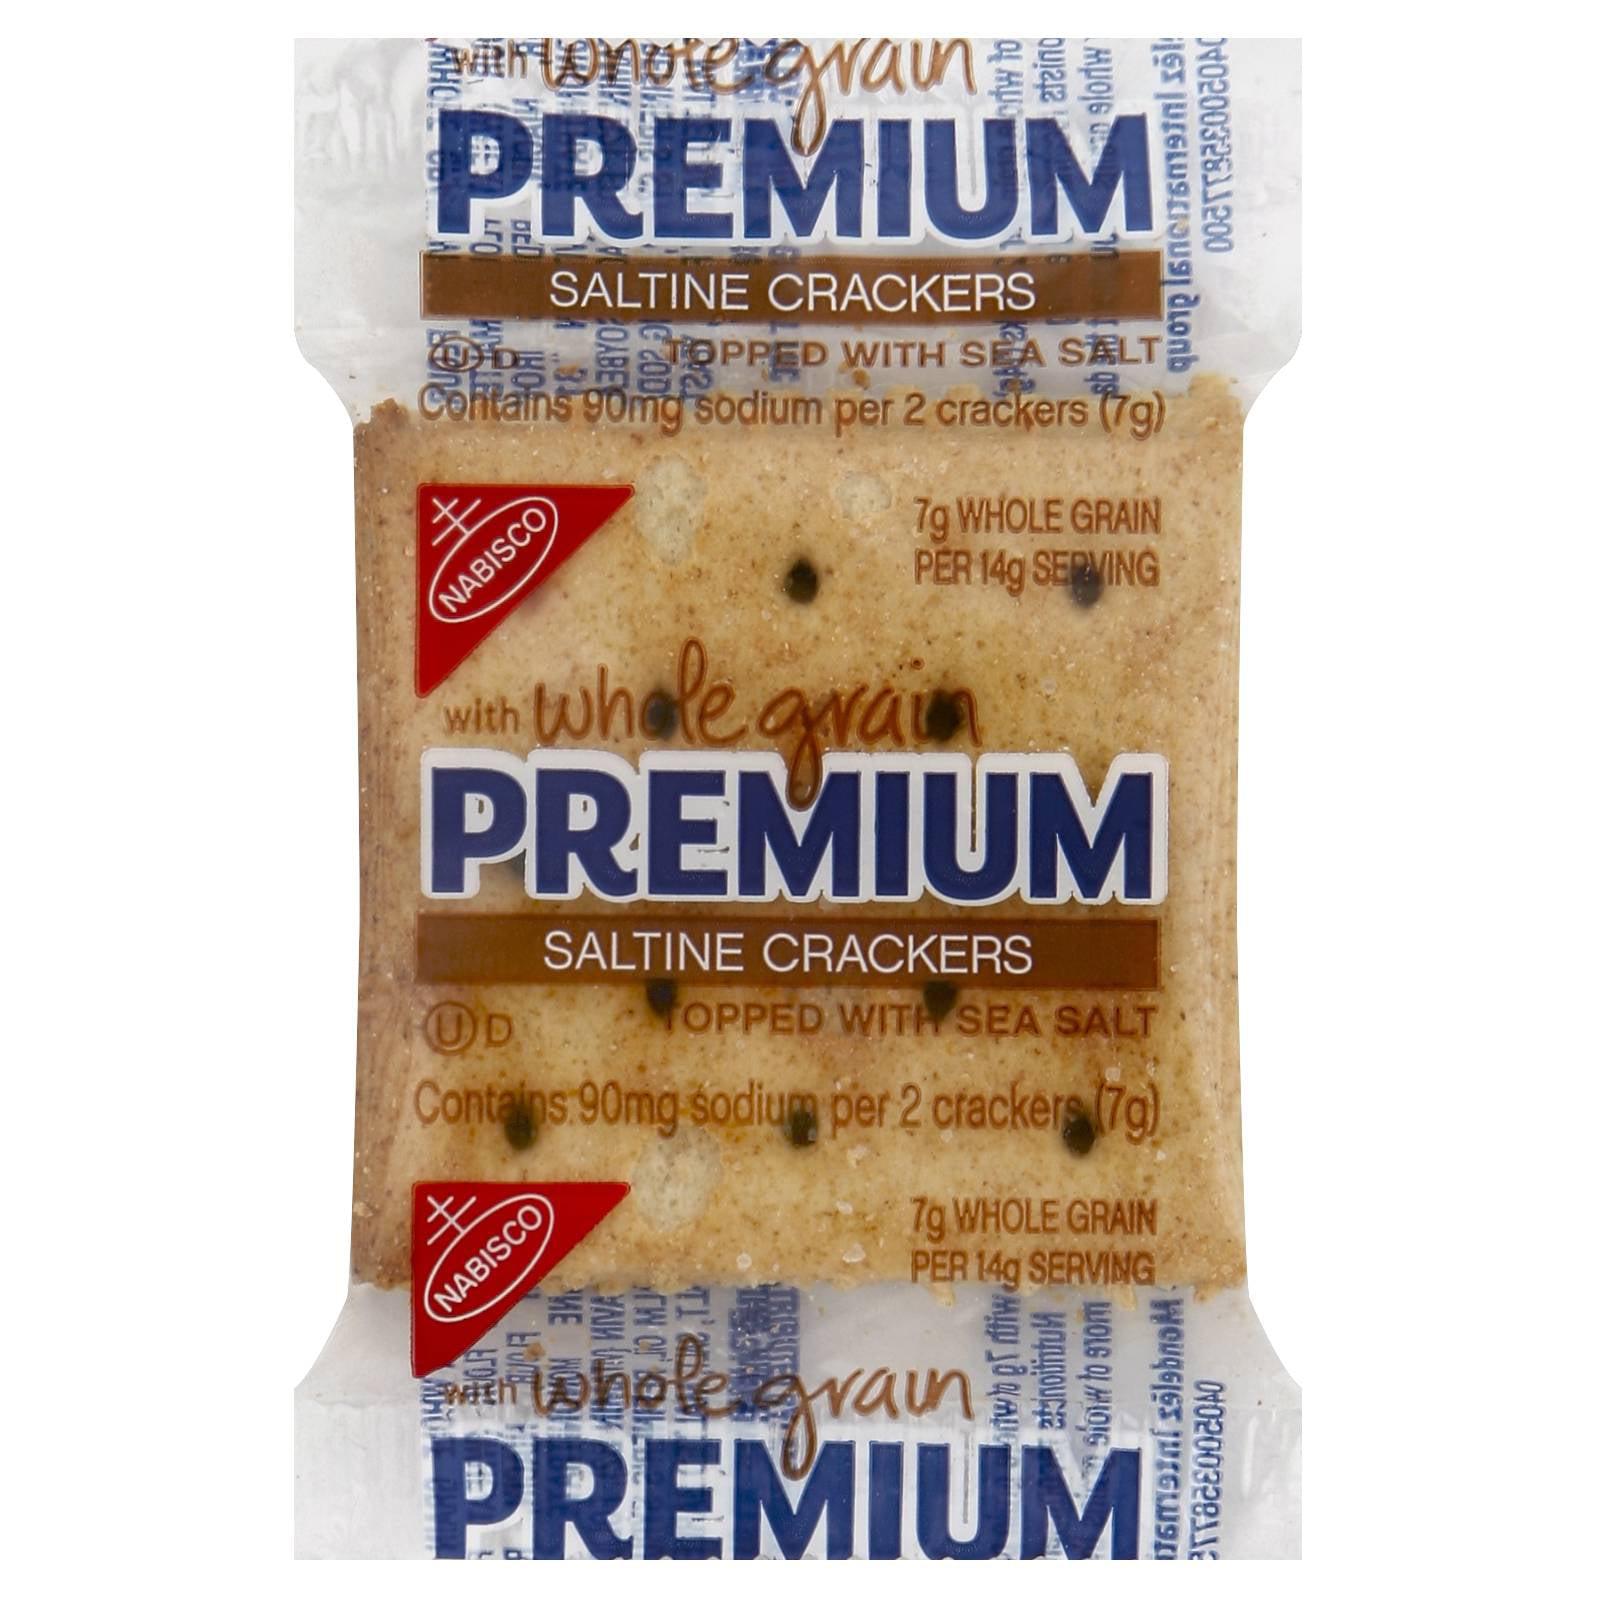 Premium Mondelez Foodservice Whole Grain Crackers Saltines 0.24oz (PACK OF 500)